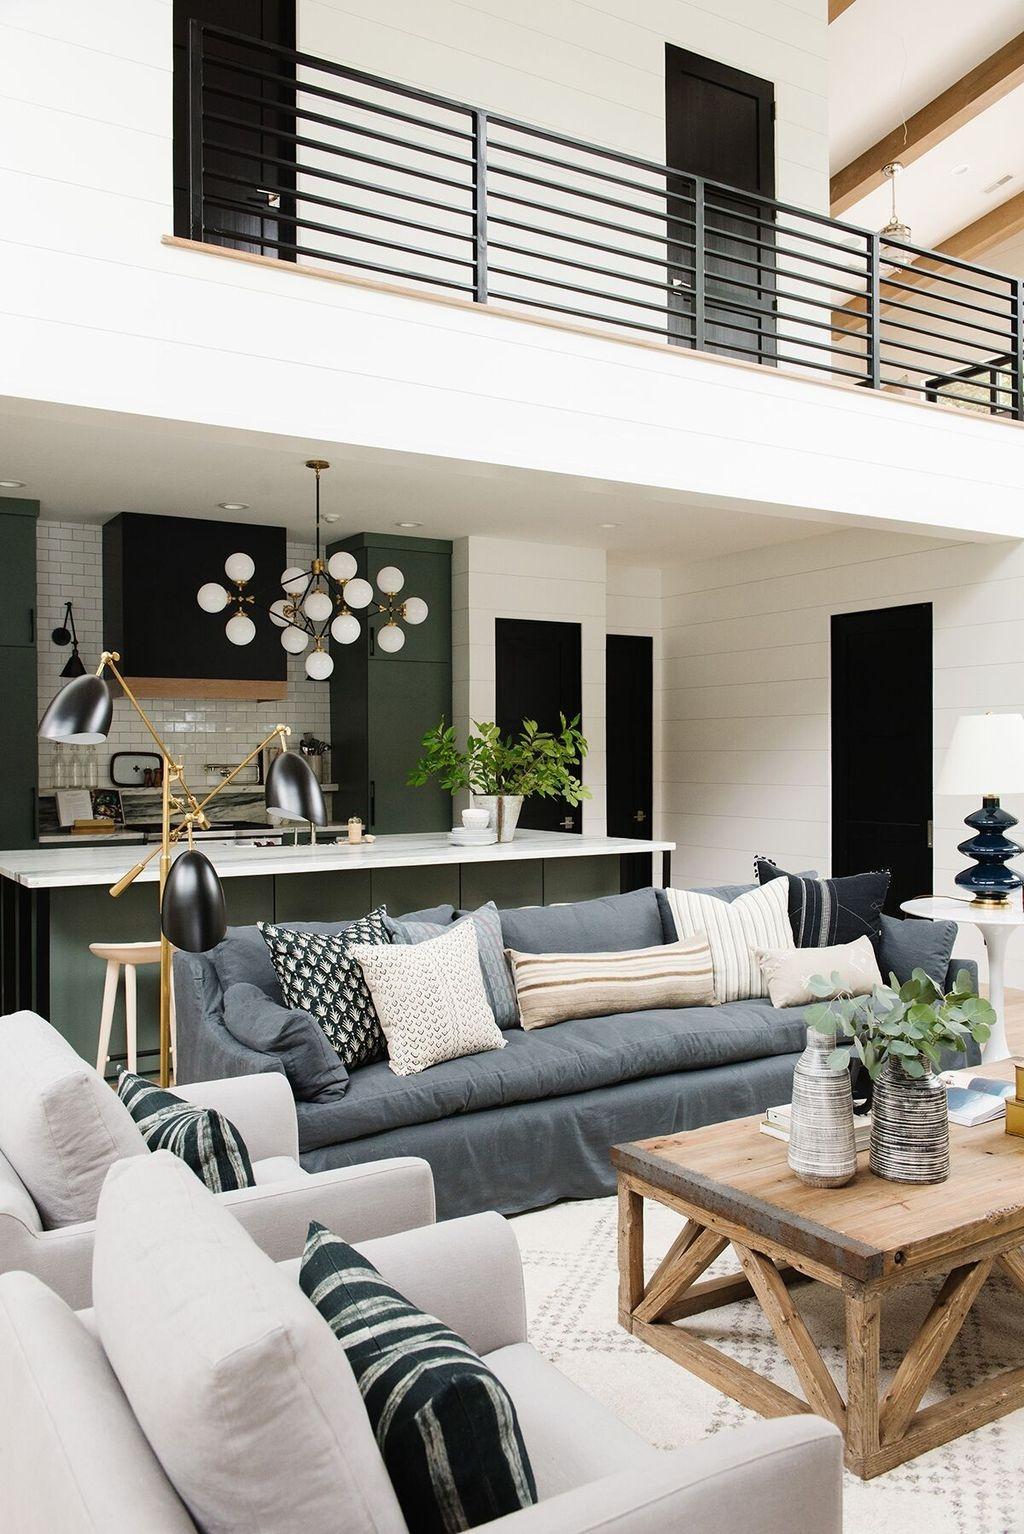 20+ Inexpensive Interior Design Ideas To Copy - TRENDECORS